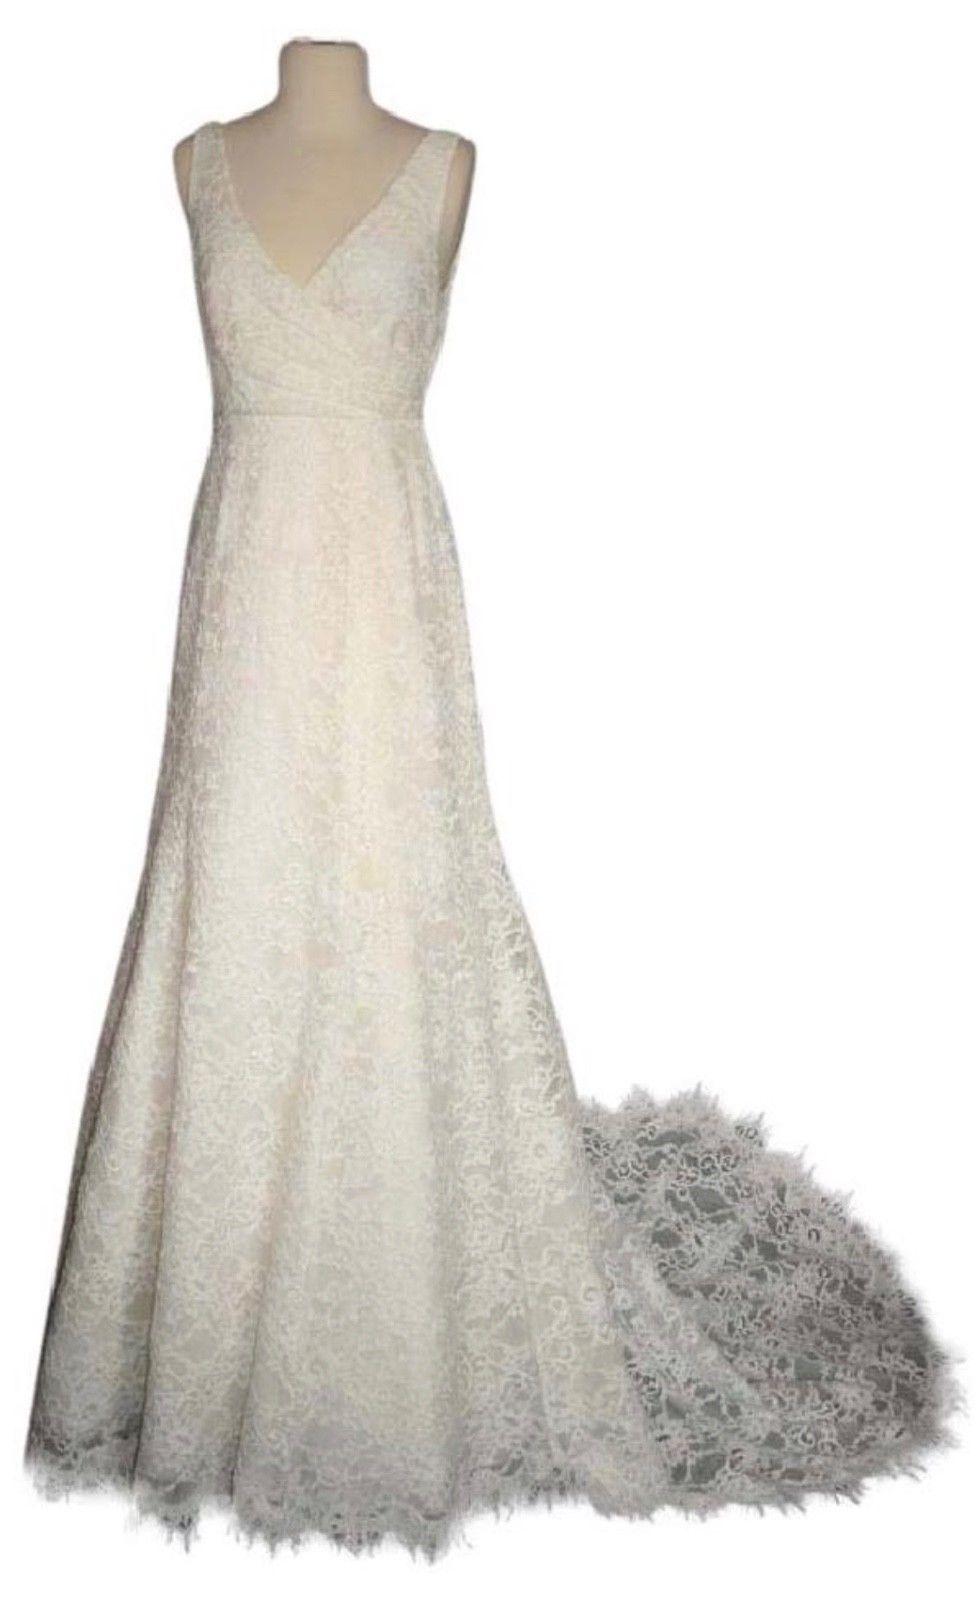 Old fashioned lace wedding dress 29